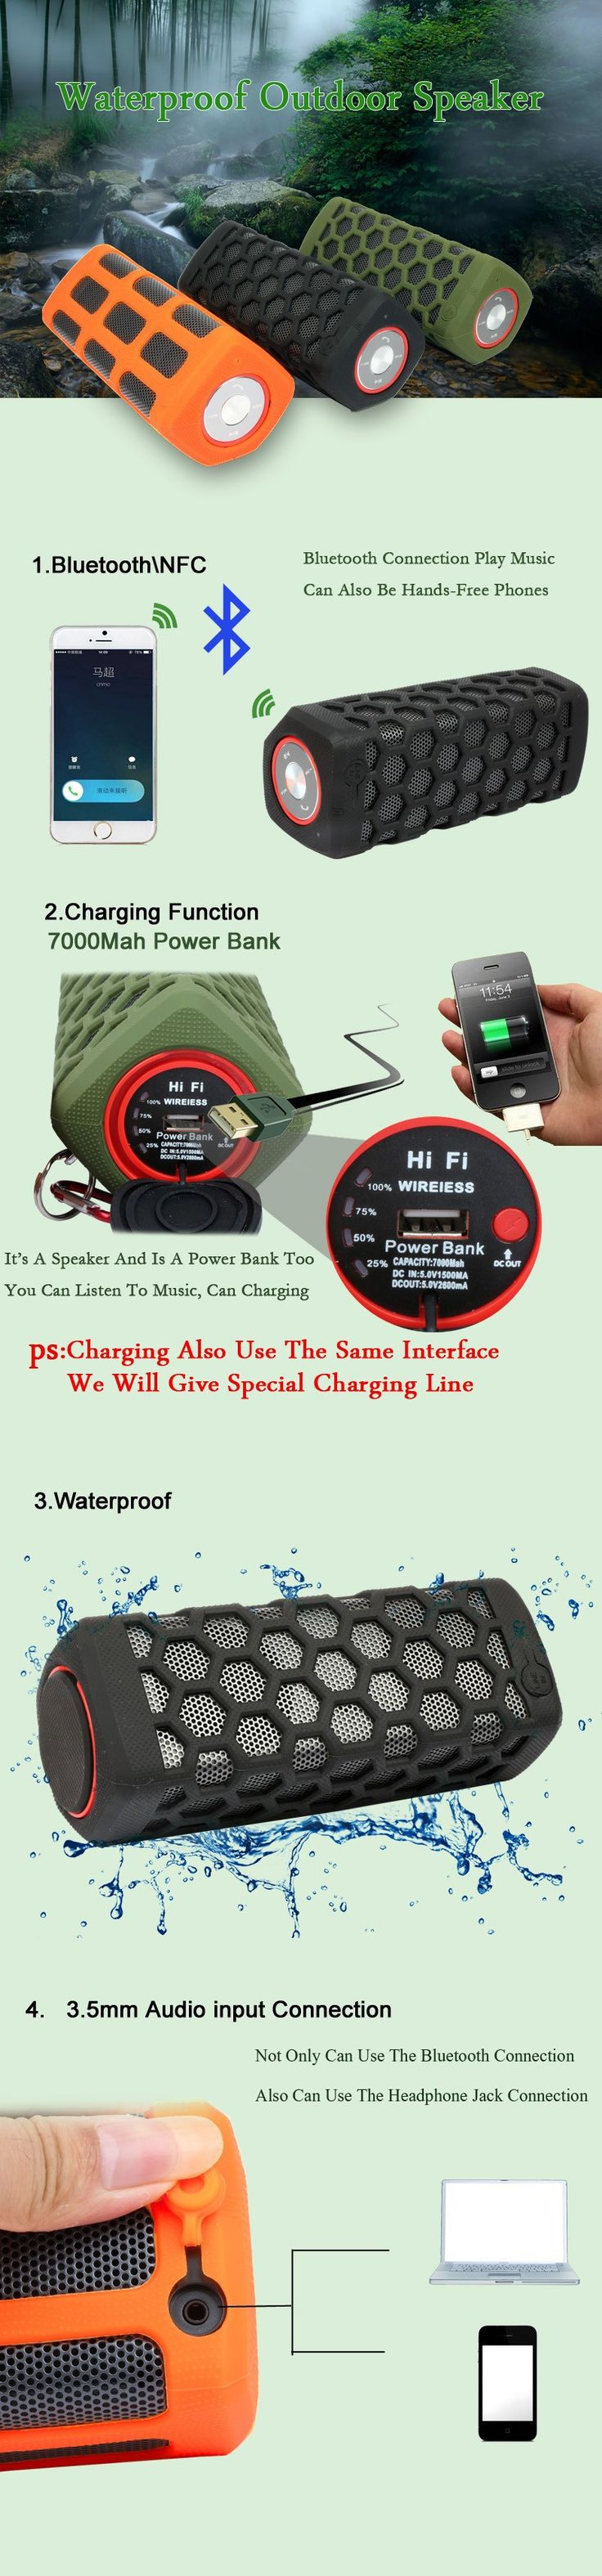 Best 25 Wireless outdoor speakers ideas on Pinterest